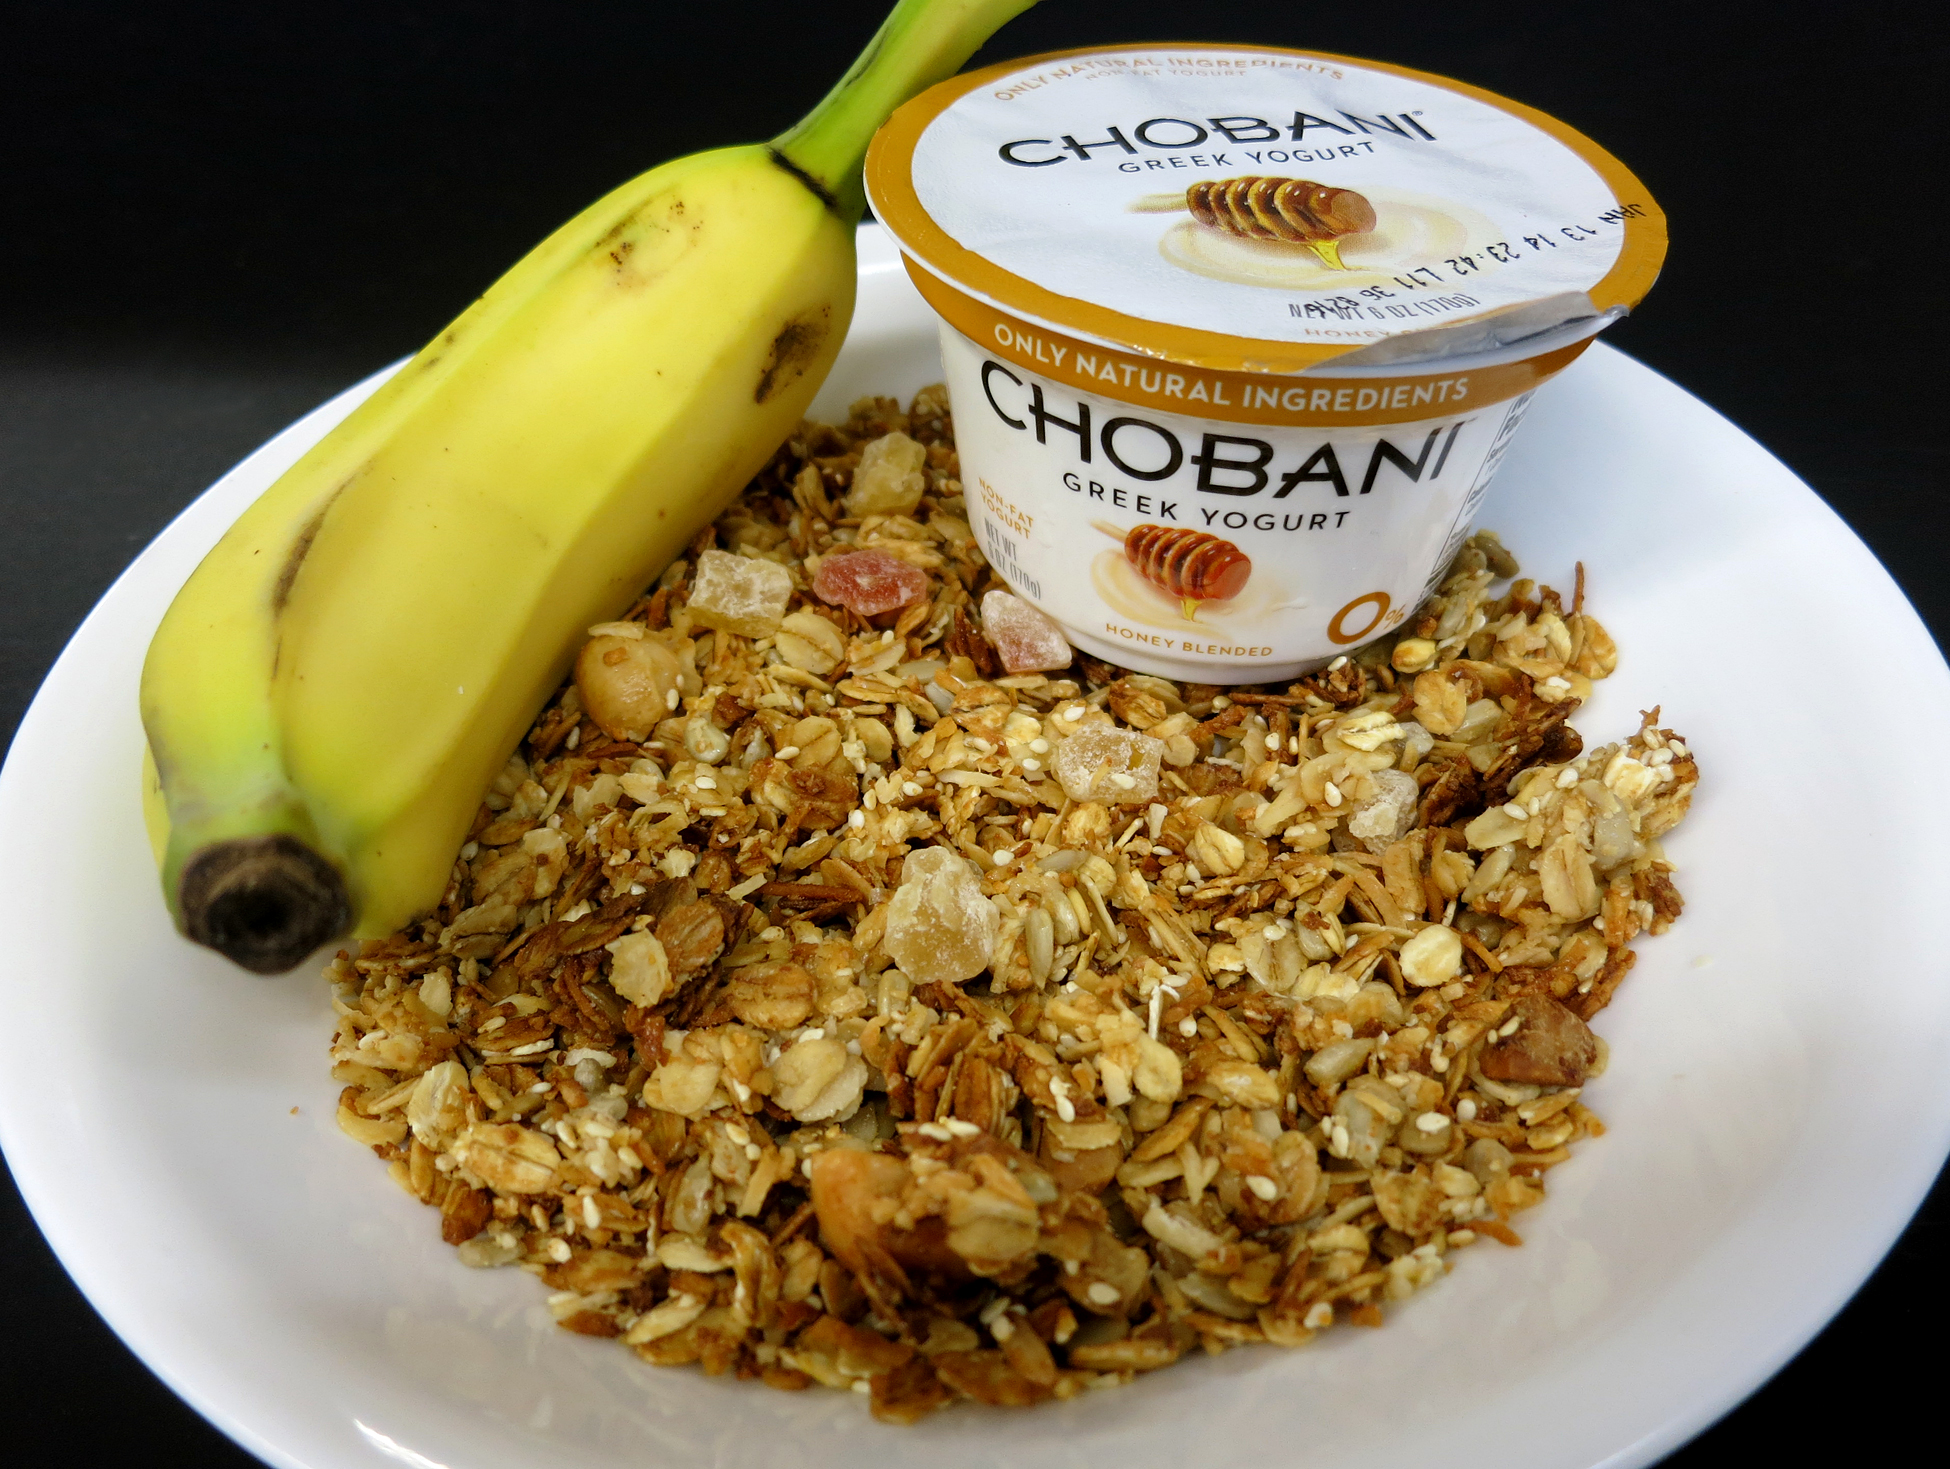 Image result for chobani yogurt with granola